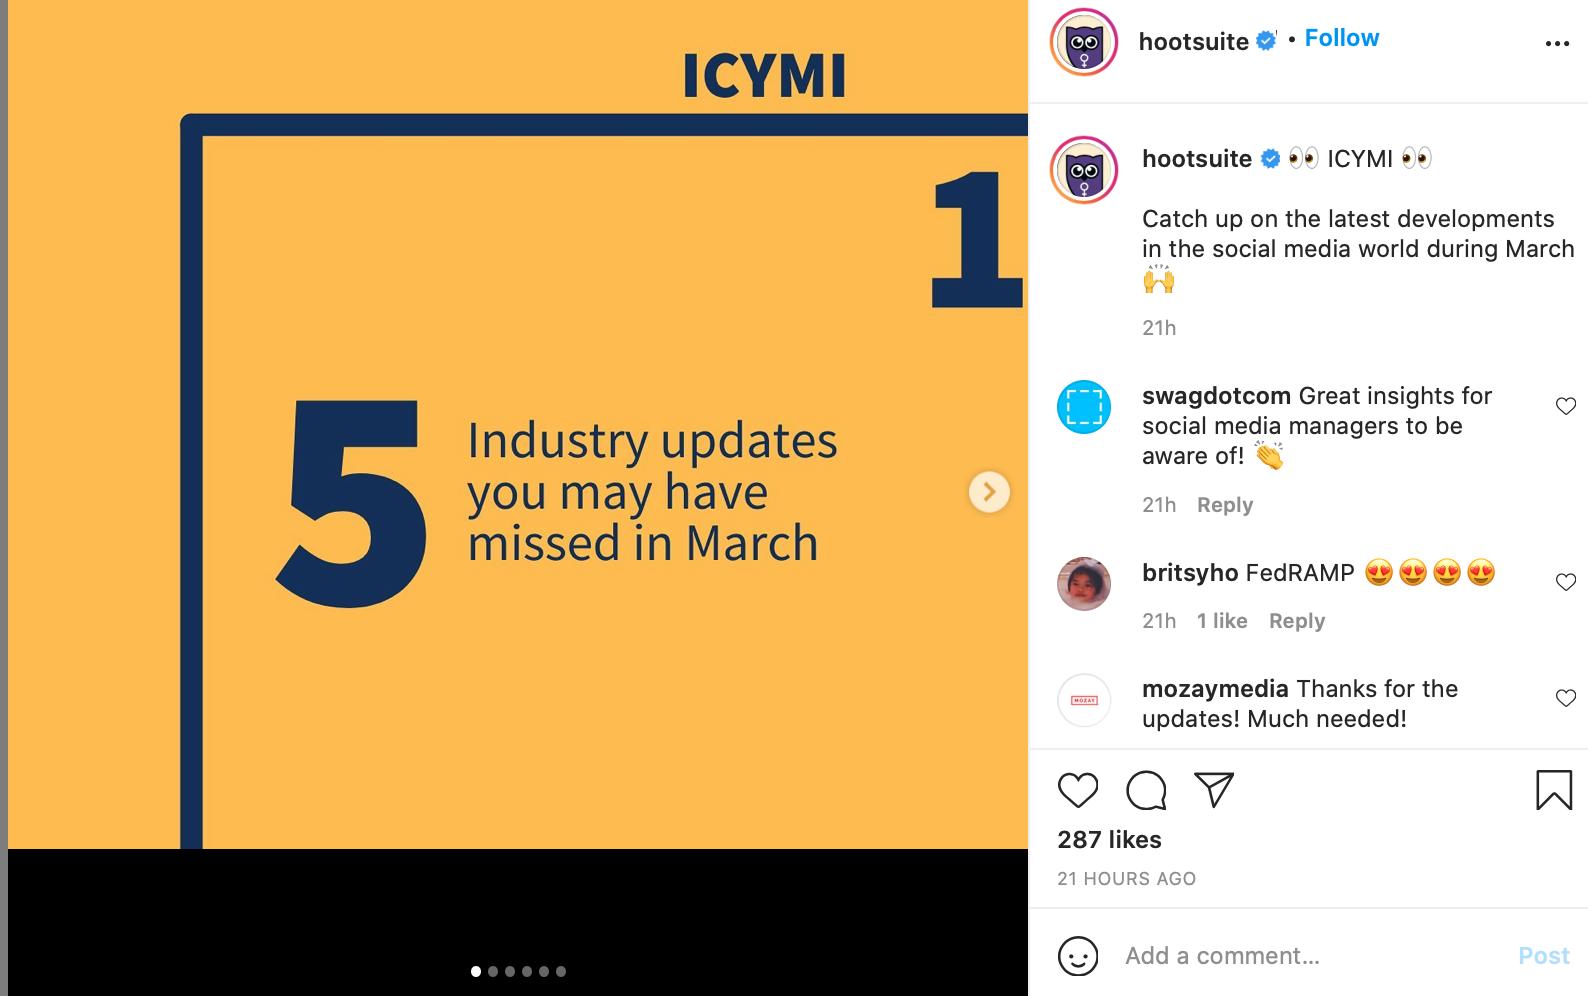 B2B Instagram account